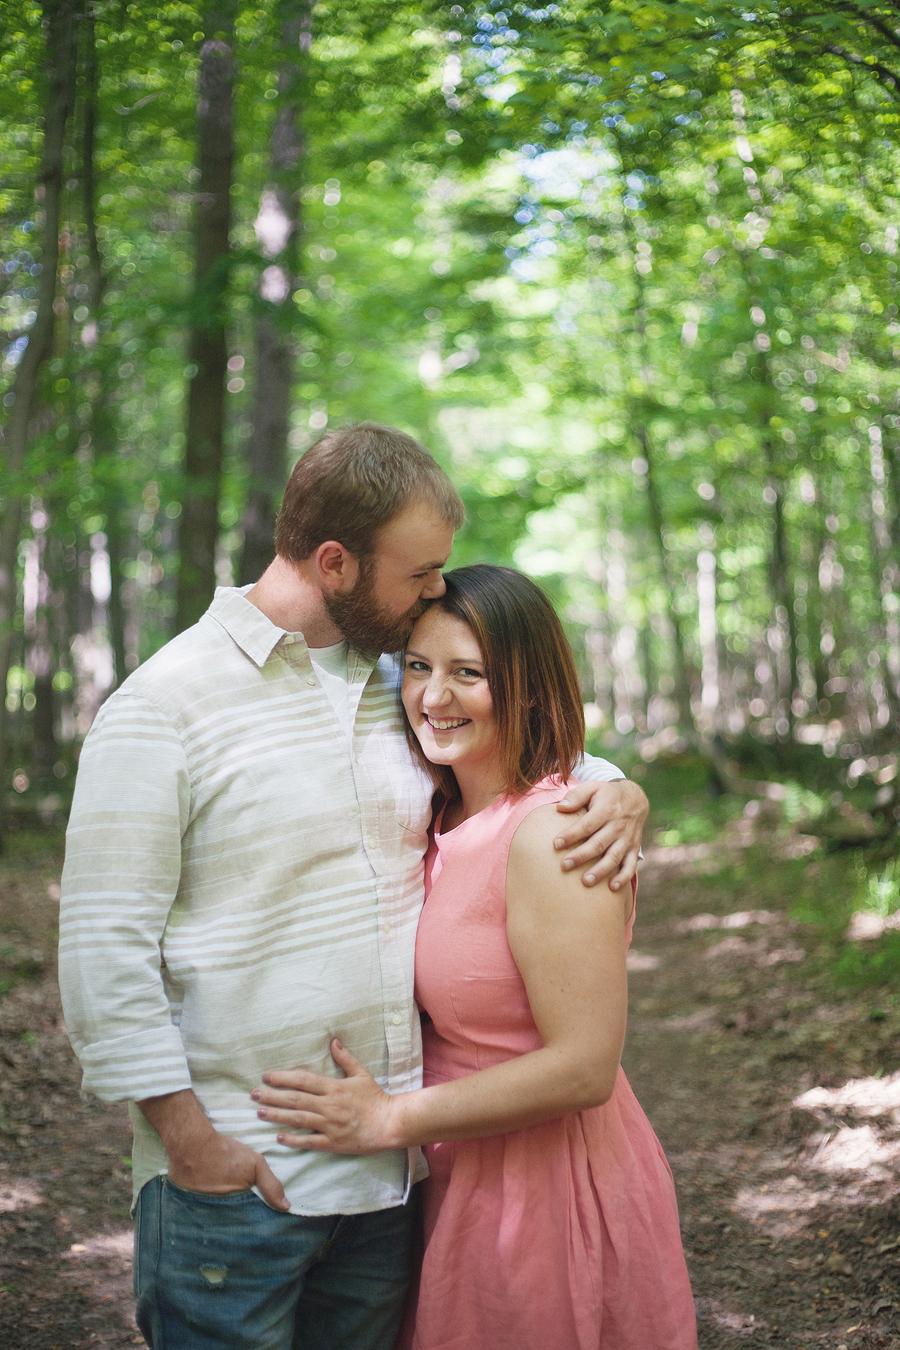 Toledo_Cleveland_Ohio_Wedding_Portrait_Photographer-08.jpg